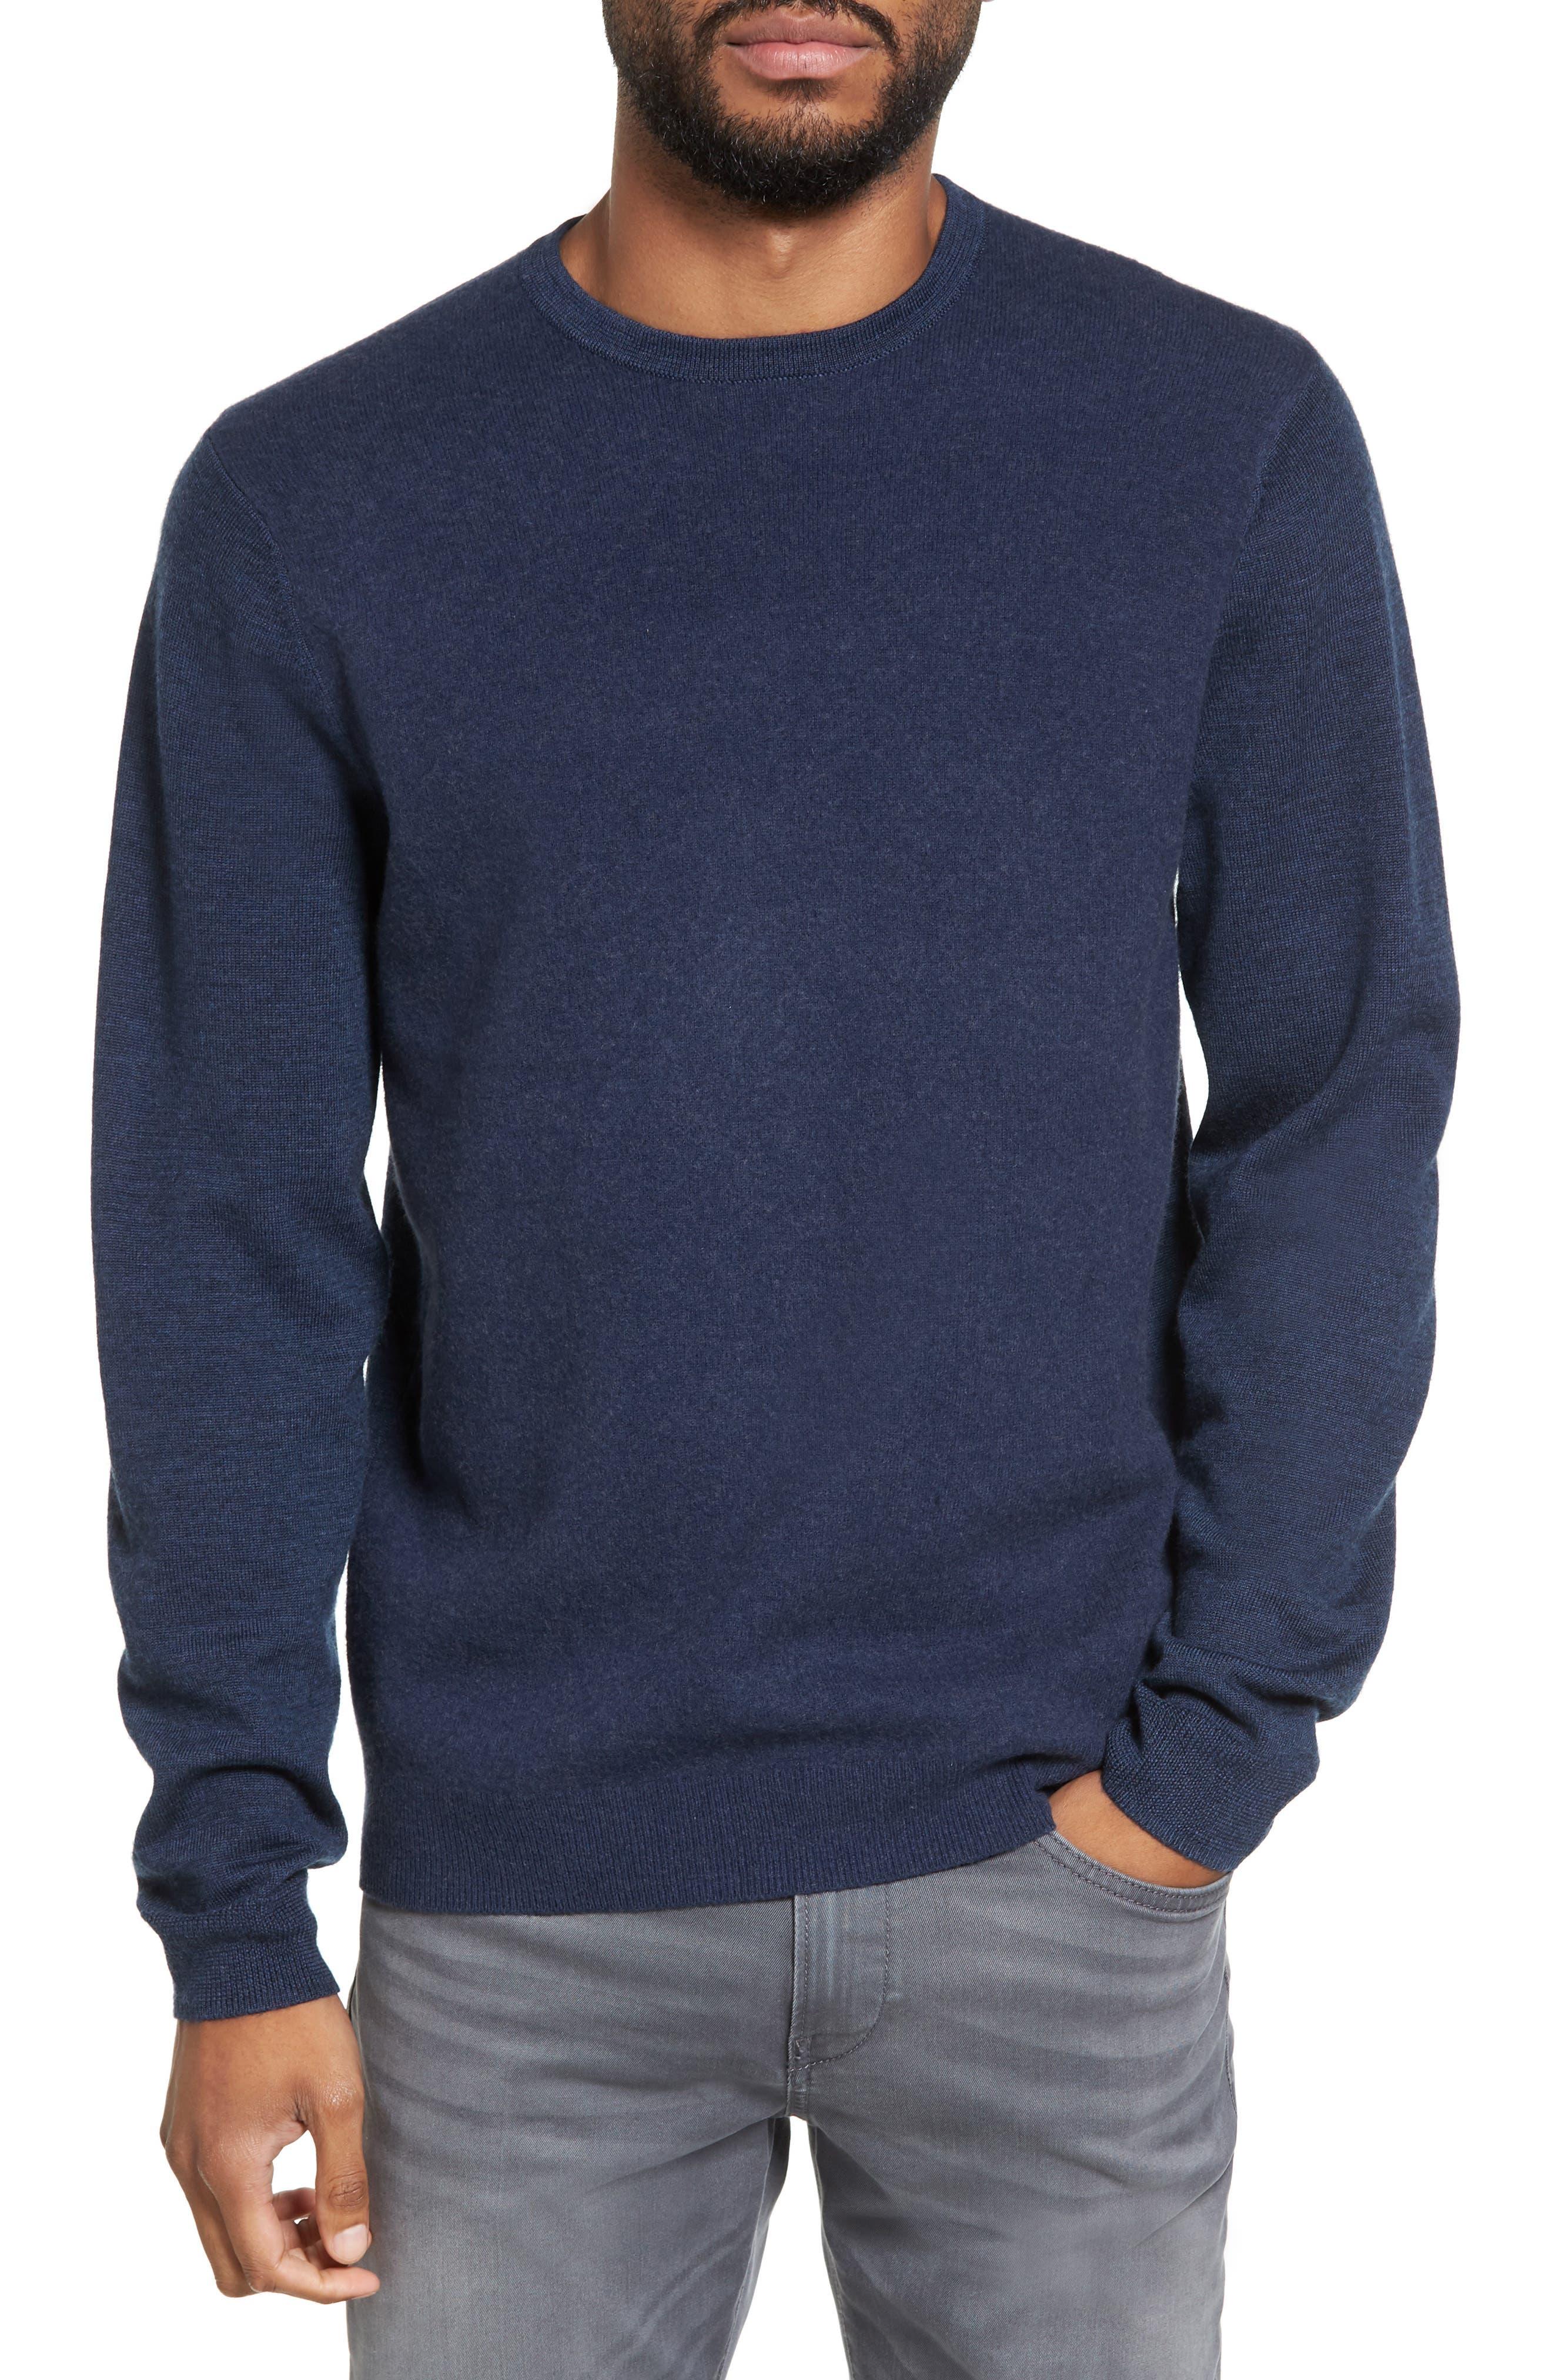 Alternate Image 1 Selected - Calibrate Merino Wool Blend Sweater